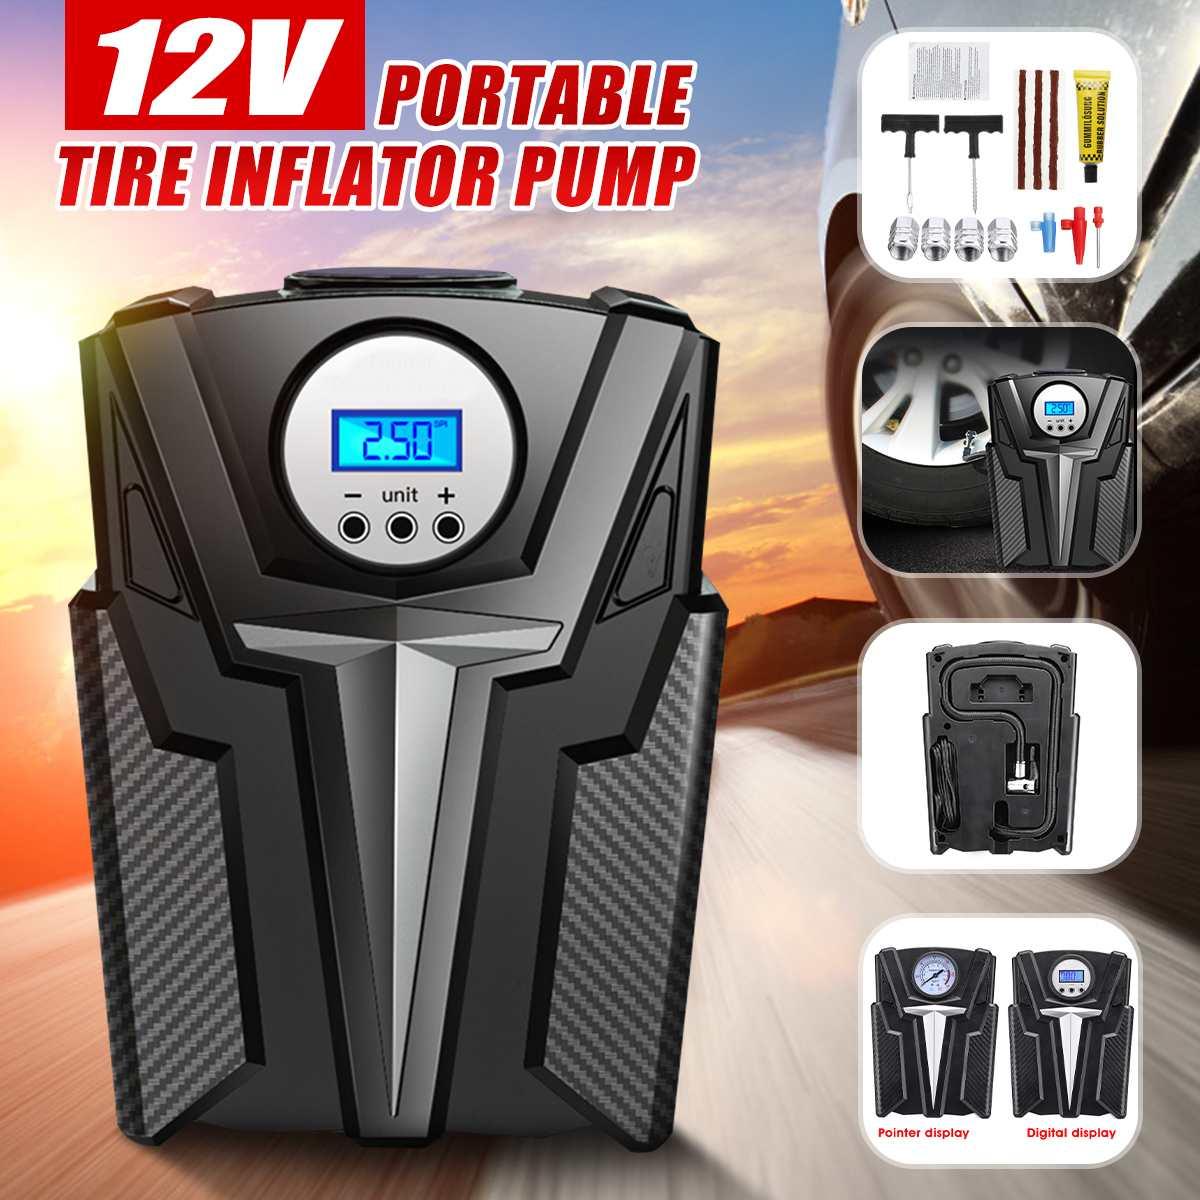 Bomba inflable Digital 12V 150 PSI HF dcportátil, Mini rueda de coche, compresor de aire, máquina eléctrica de inflado, bombas de boquilla